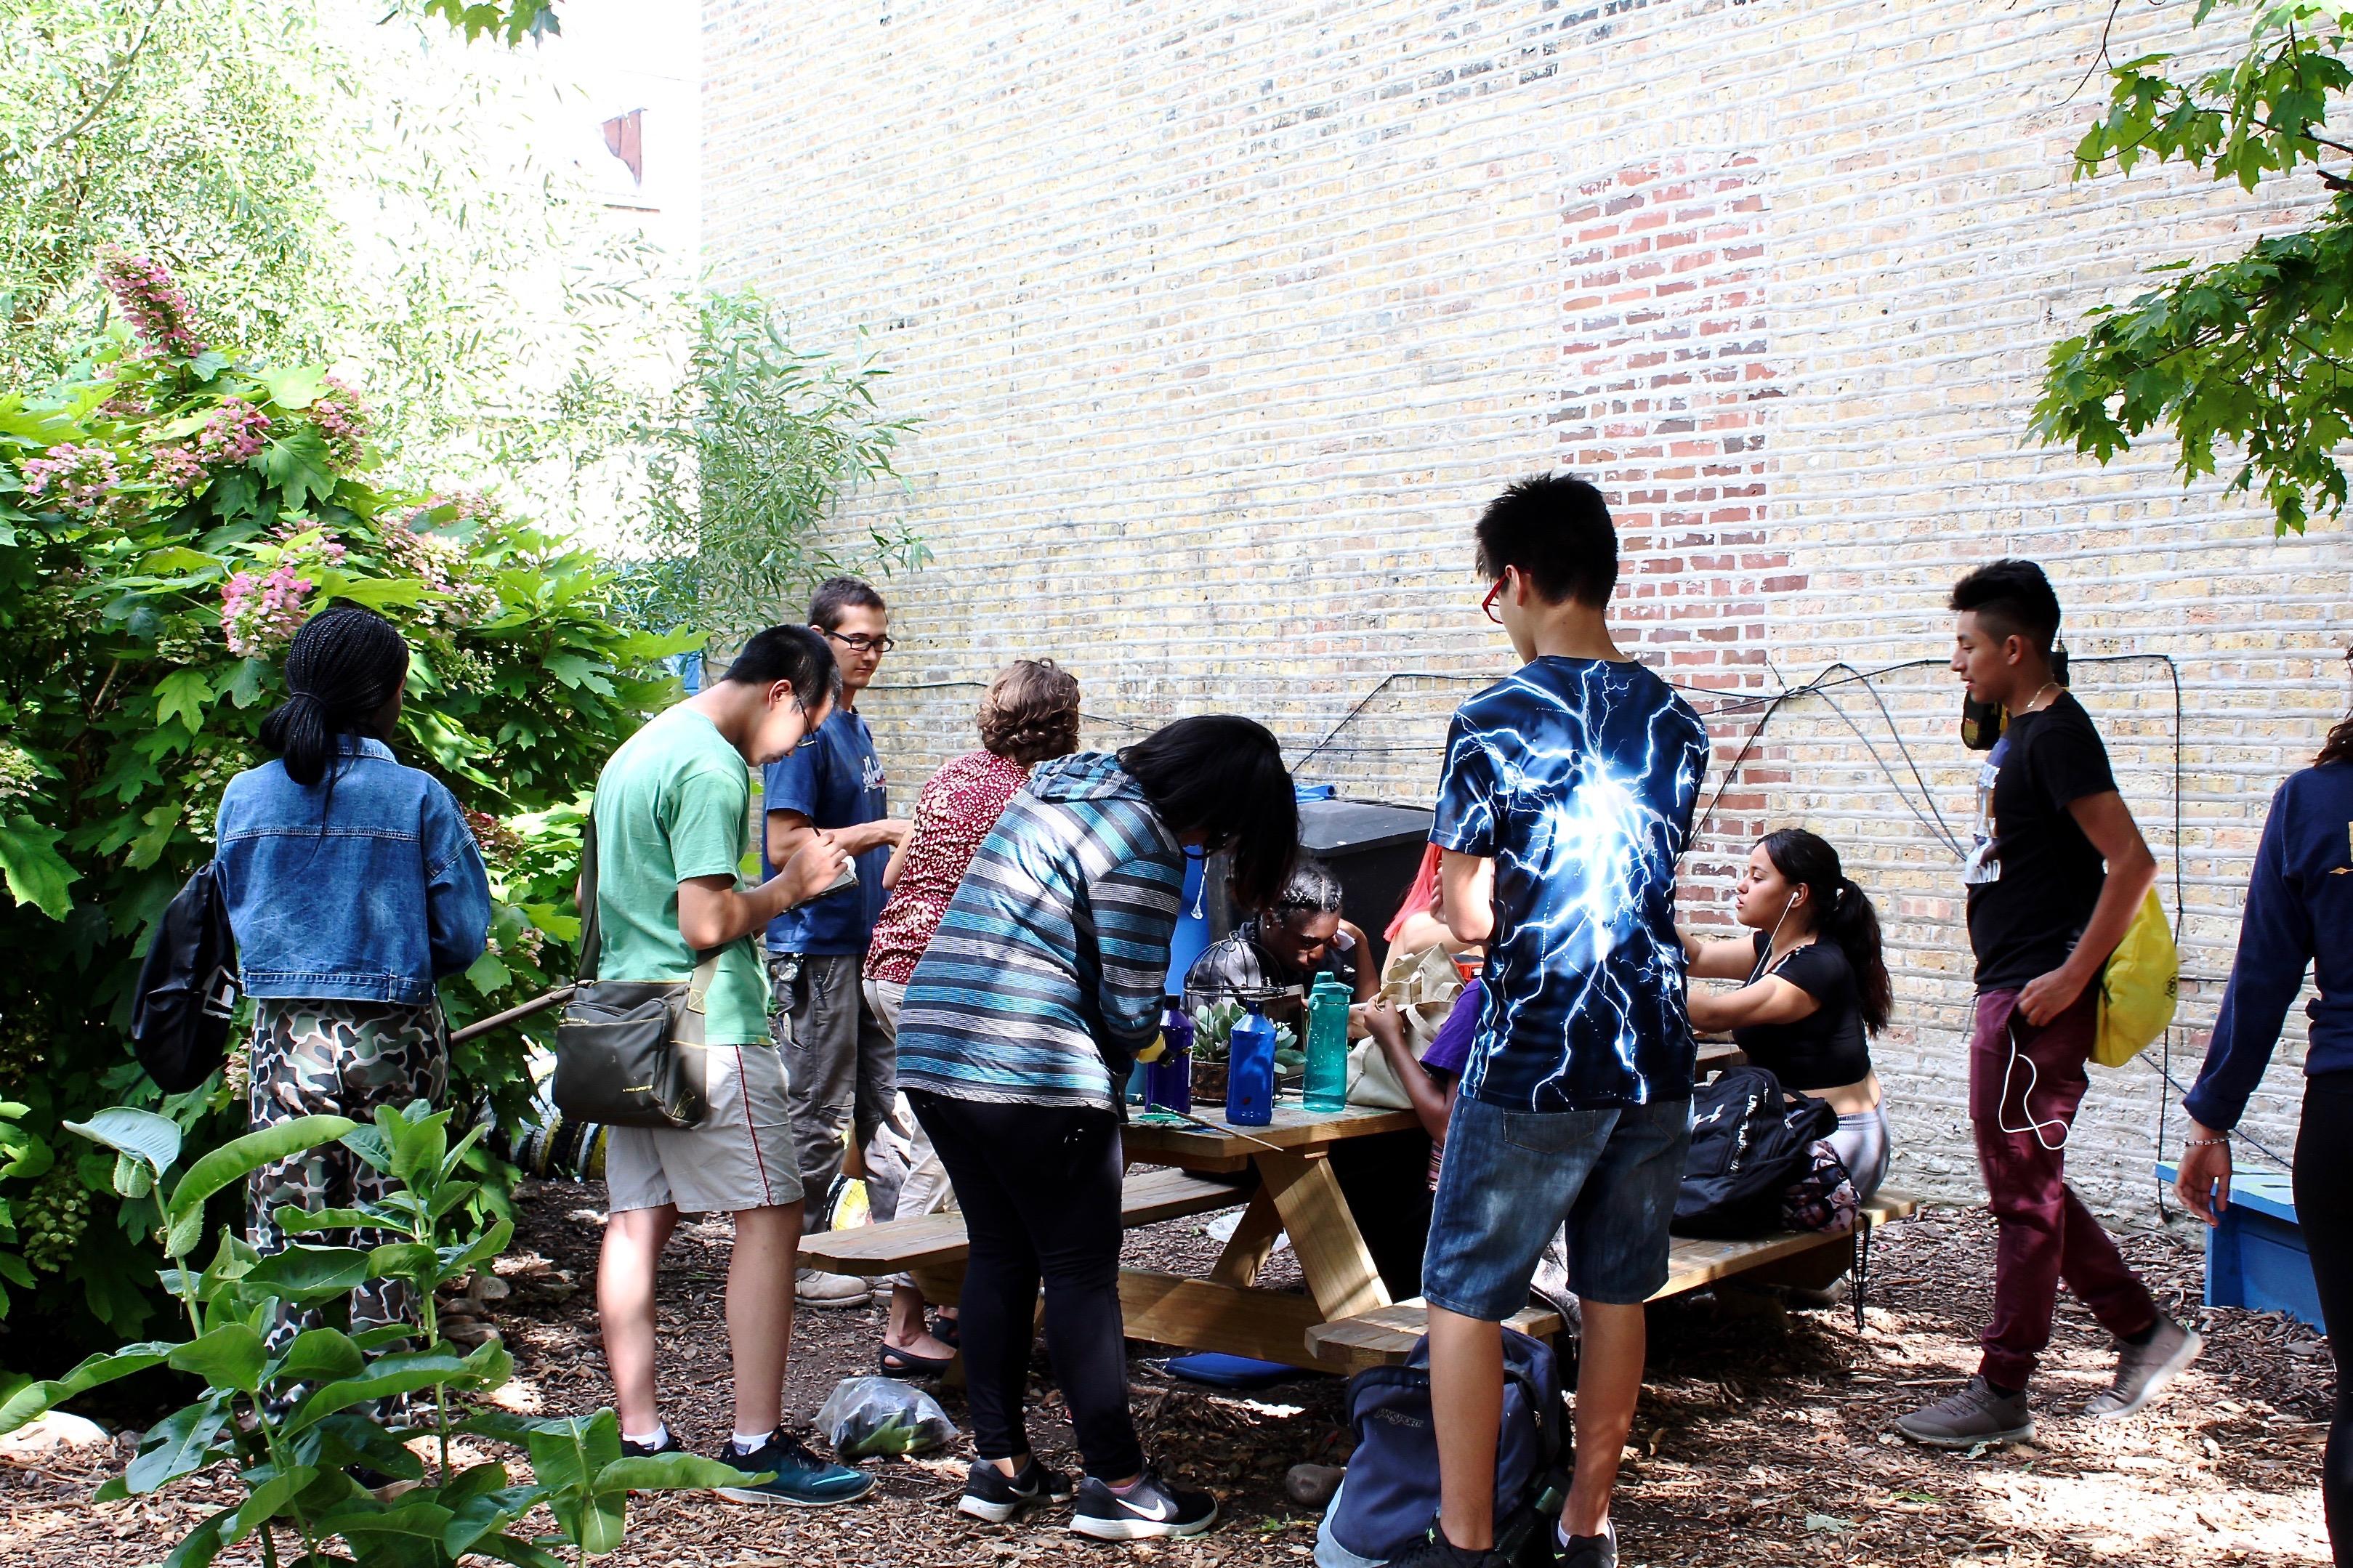 Teens gather in Jardin De Las Mariposas Garden for an After School Matters program